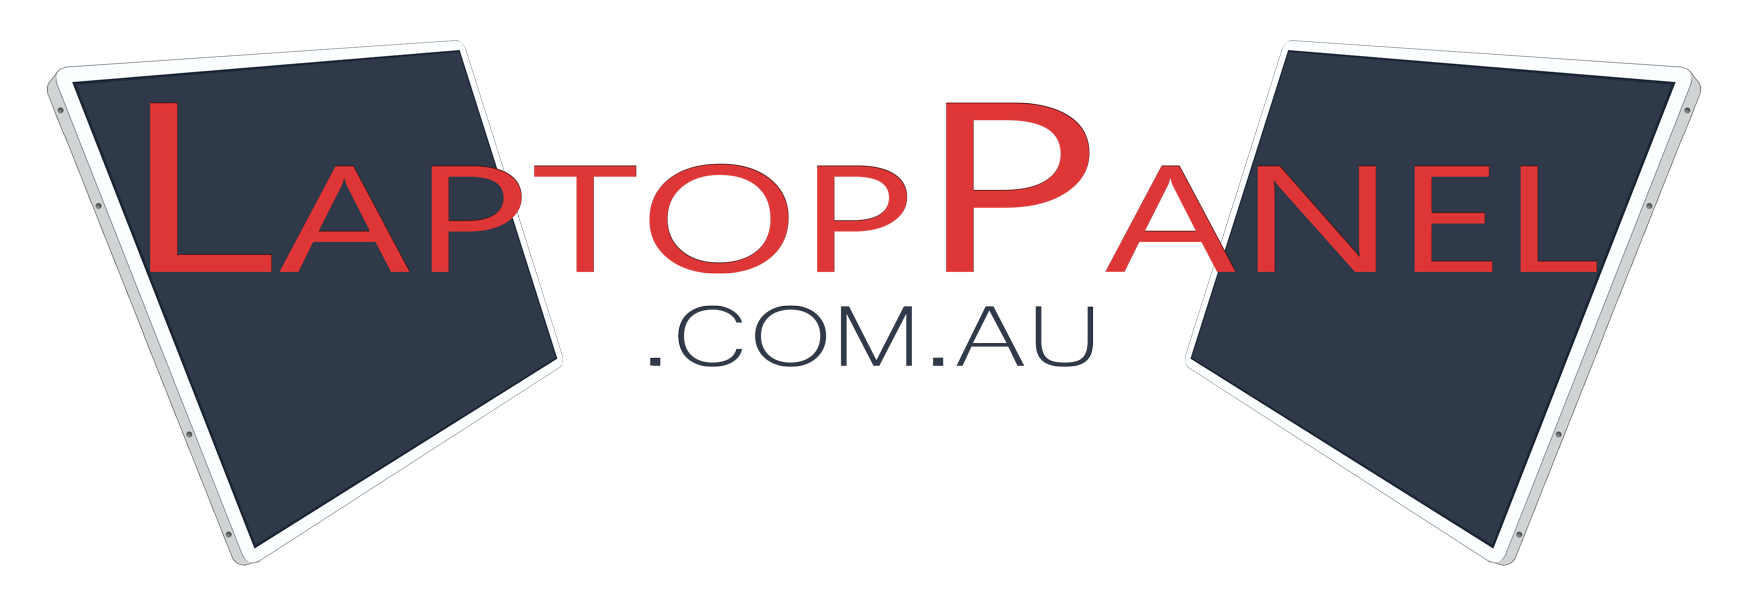 LaptopPanel.com.au